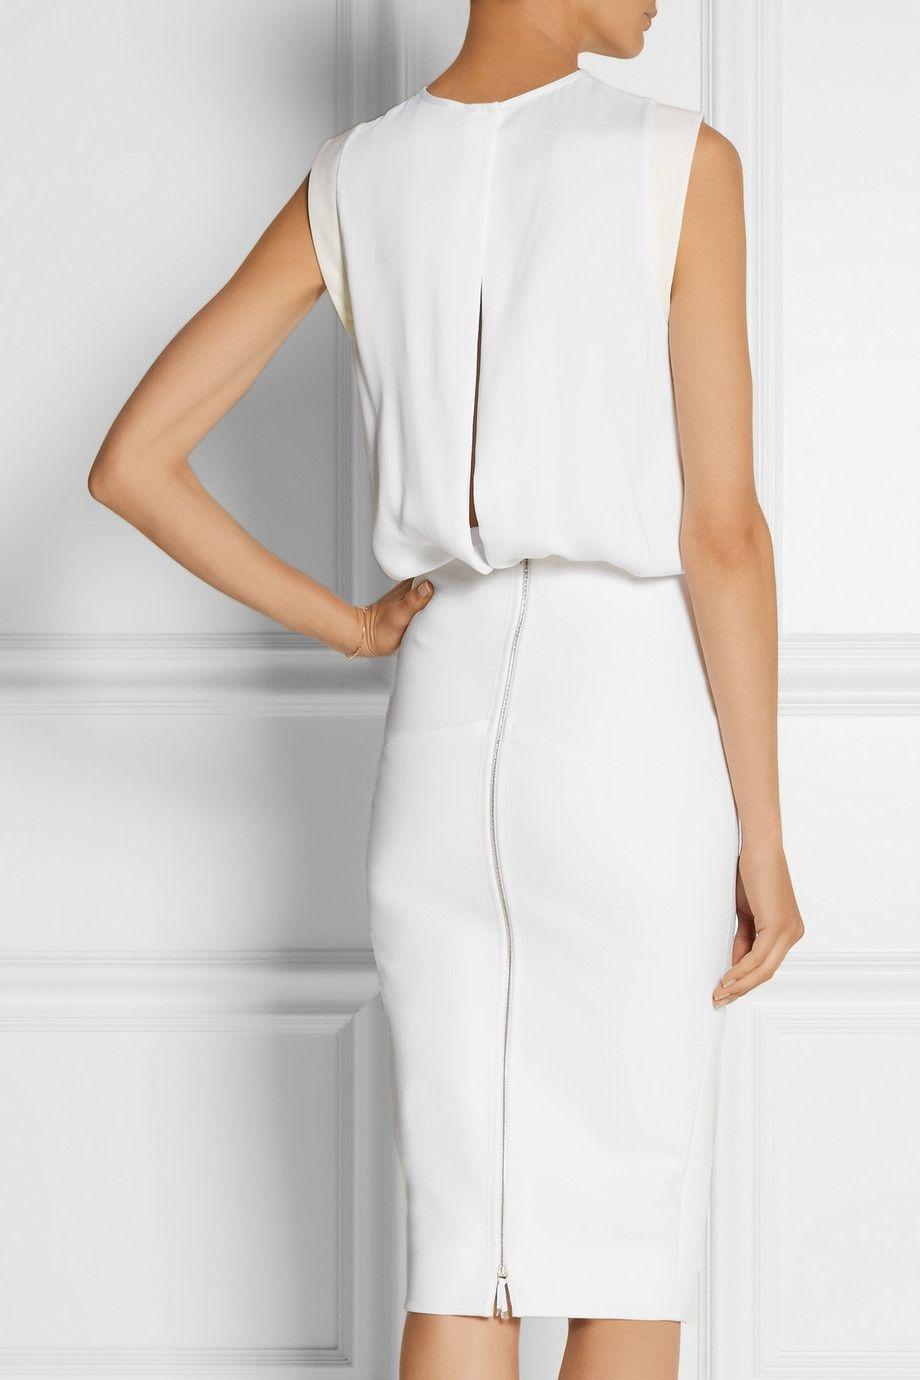 Victoria Beckham In White Classy White Dress Classy Dress White Pencil Dress [ 2000 x 1244 Pixel ]